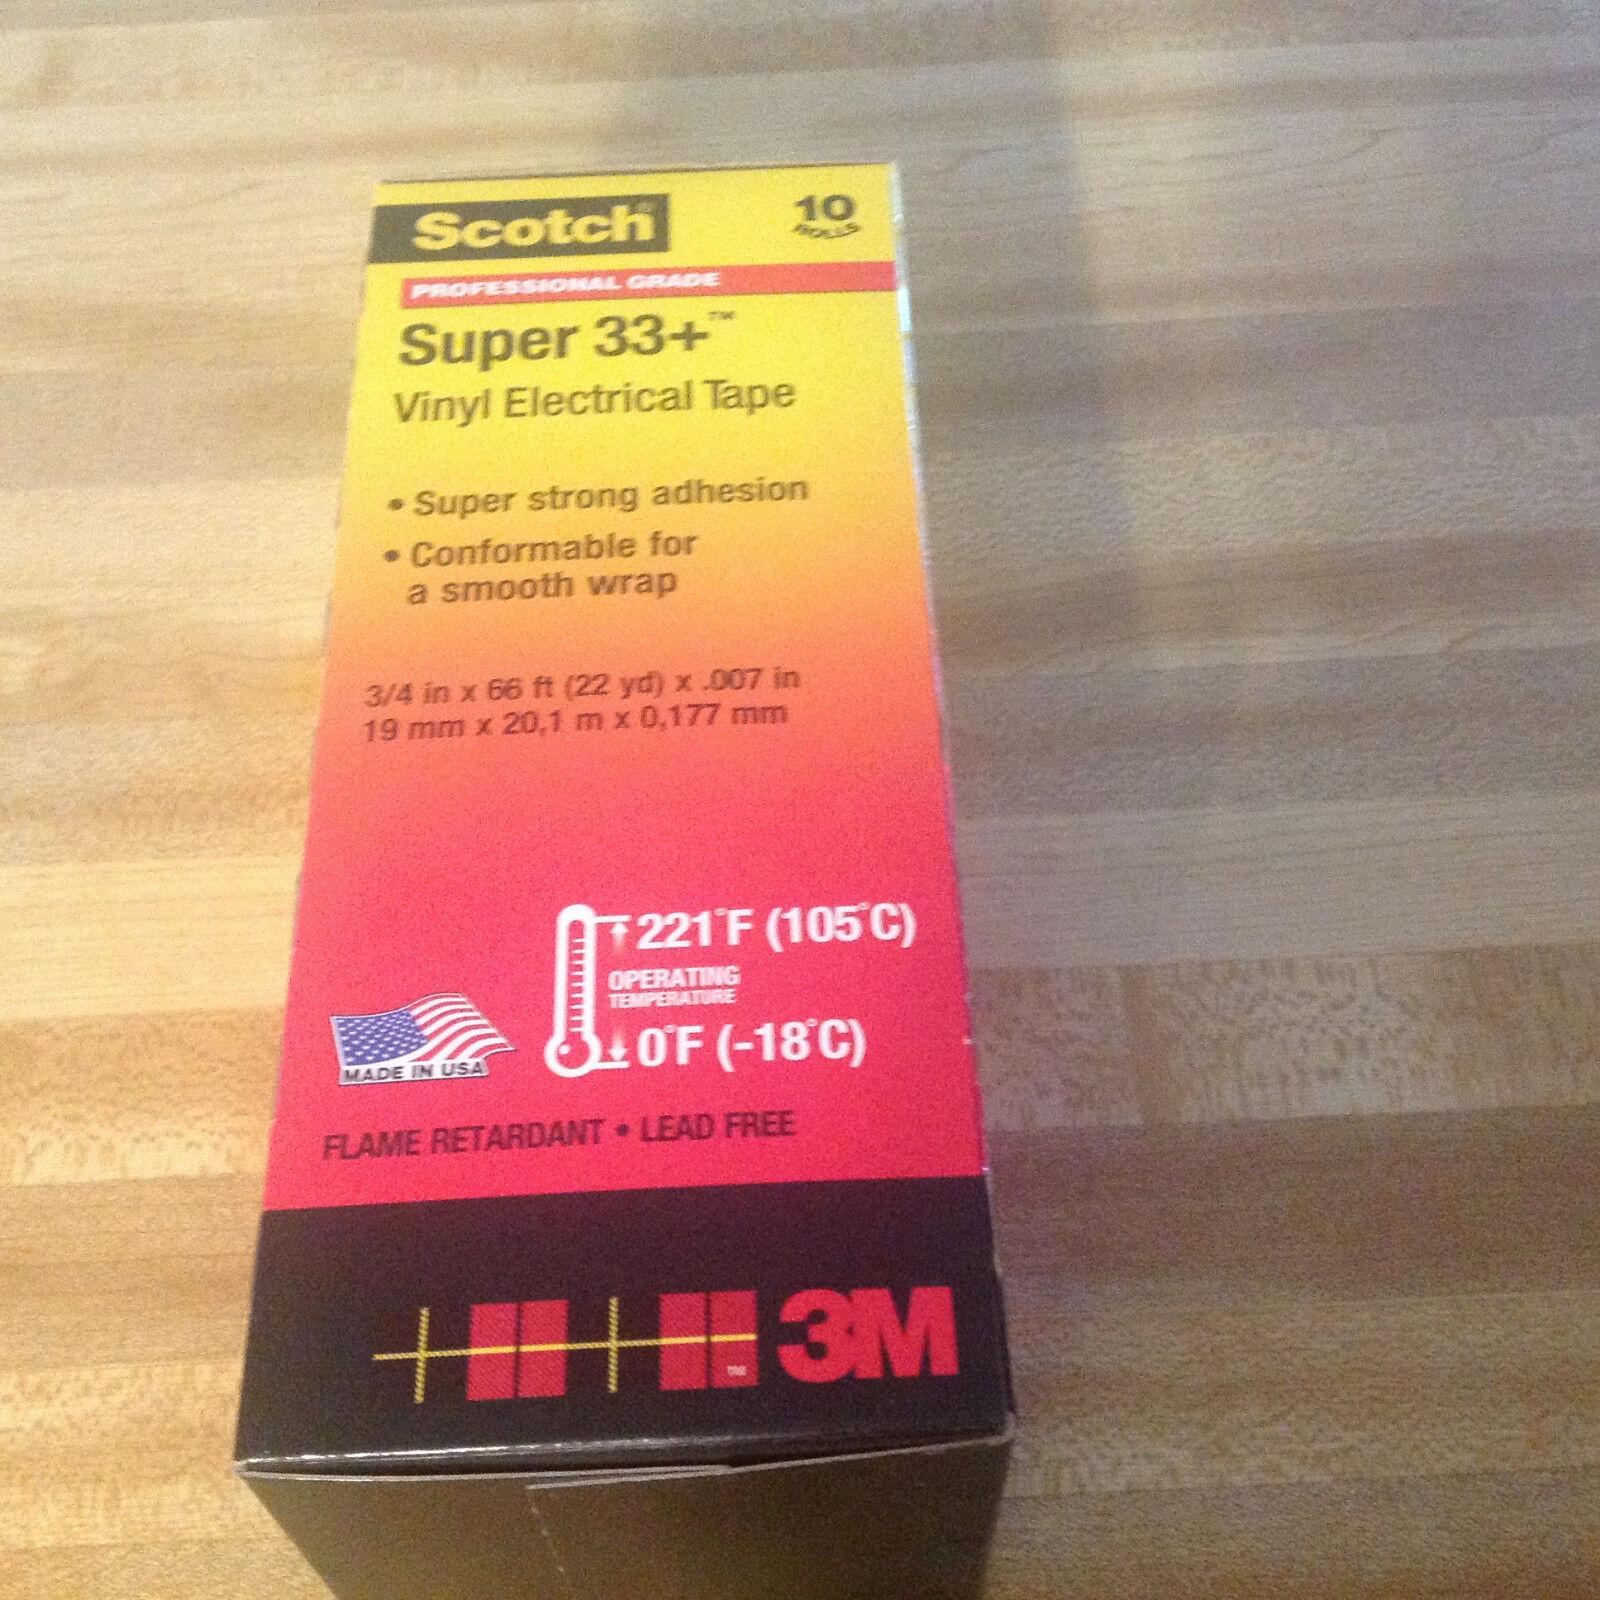 Vinyl Electrical Tape Pack of 10 Rolls Scotch Super 33 3//4 x 44 ft